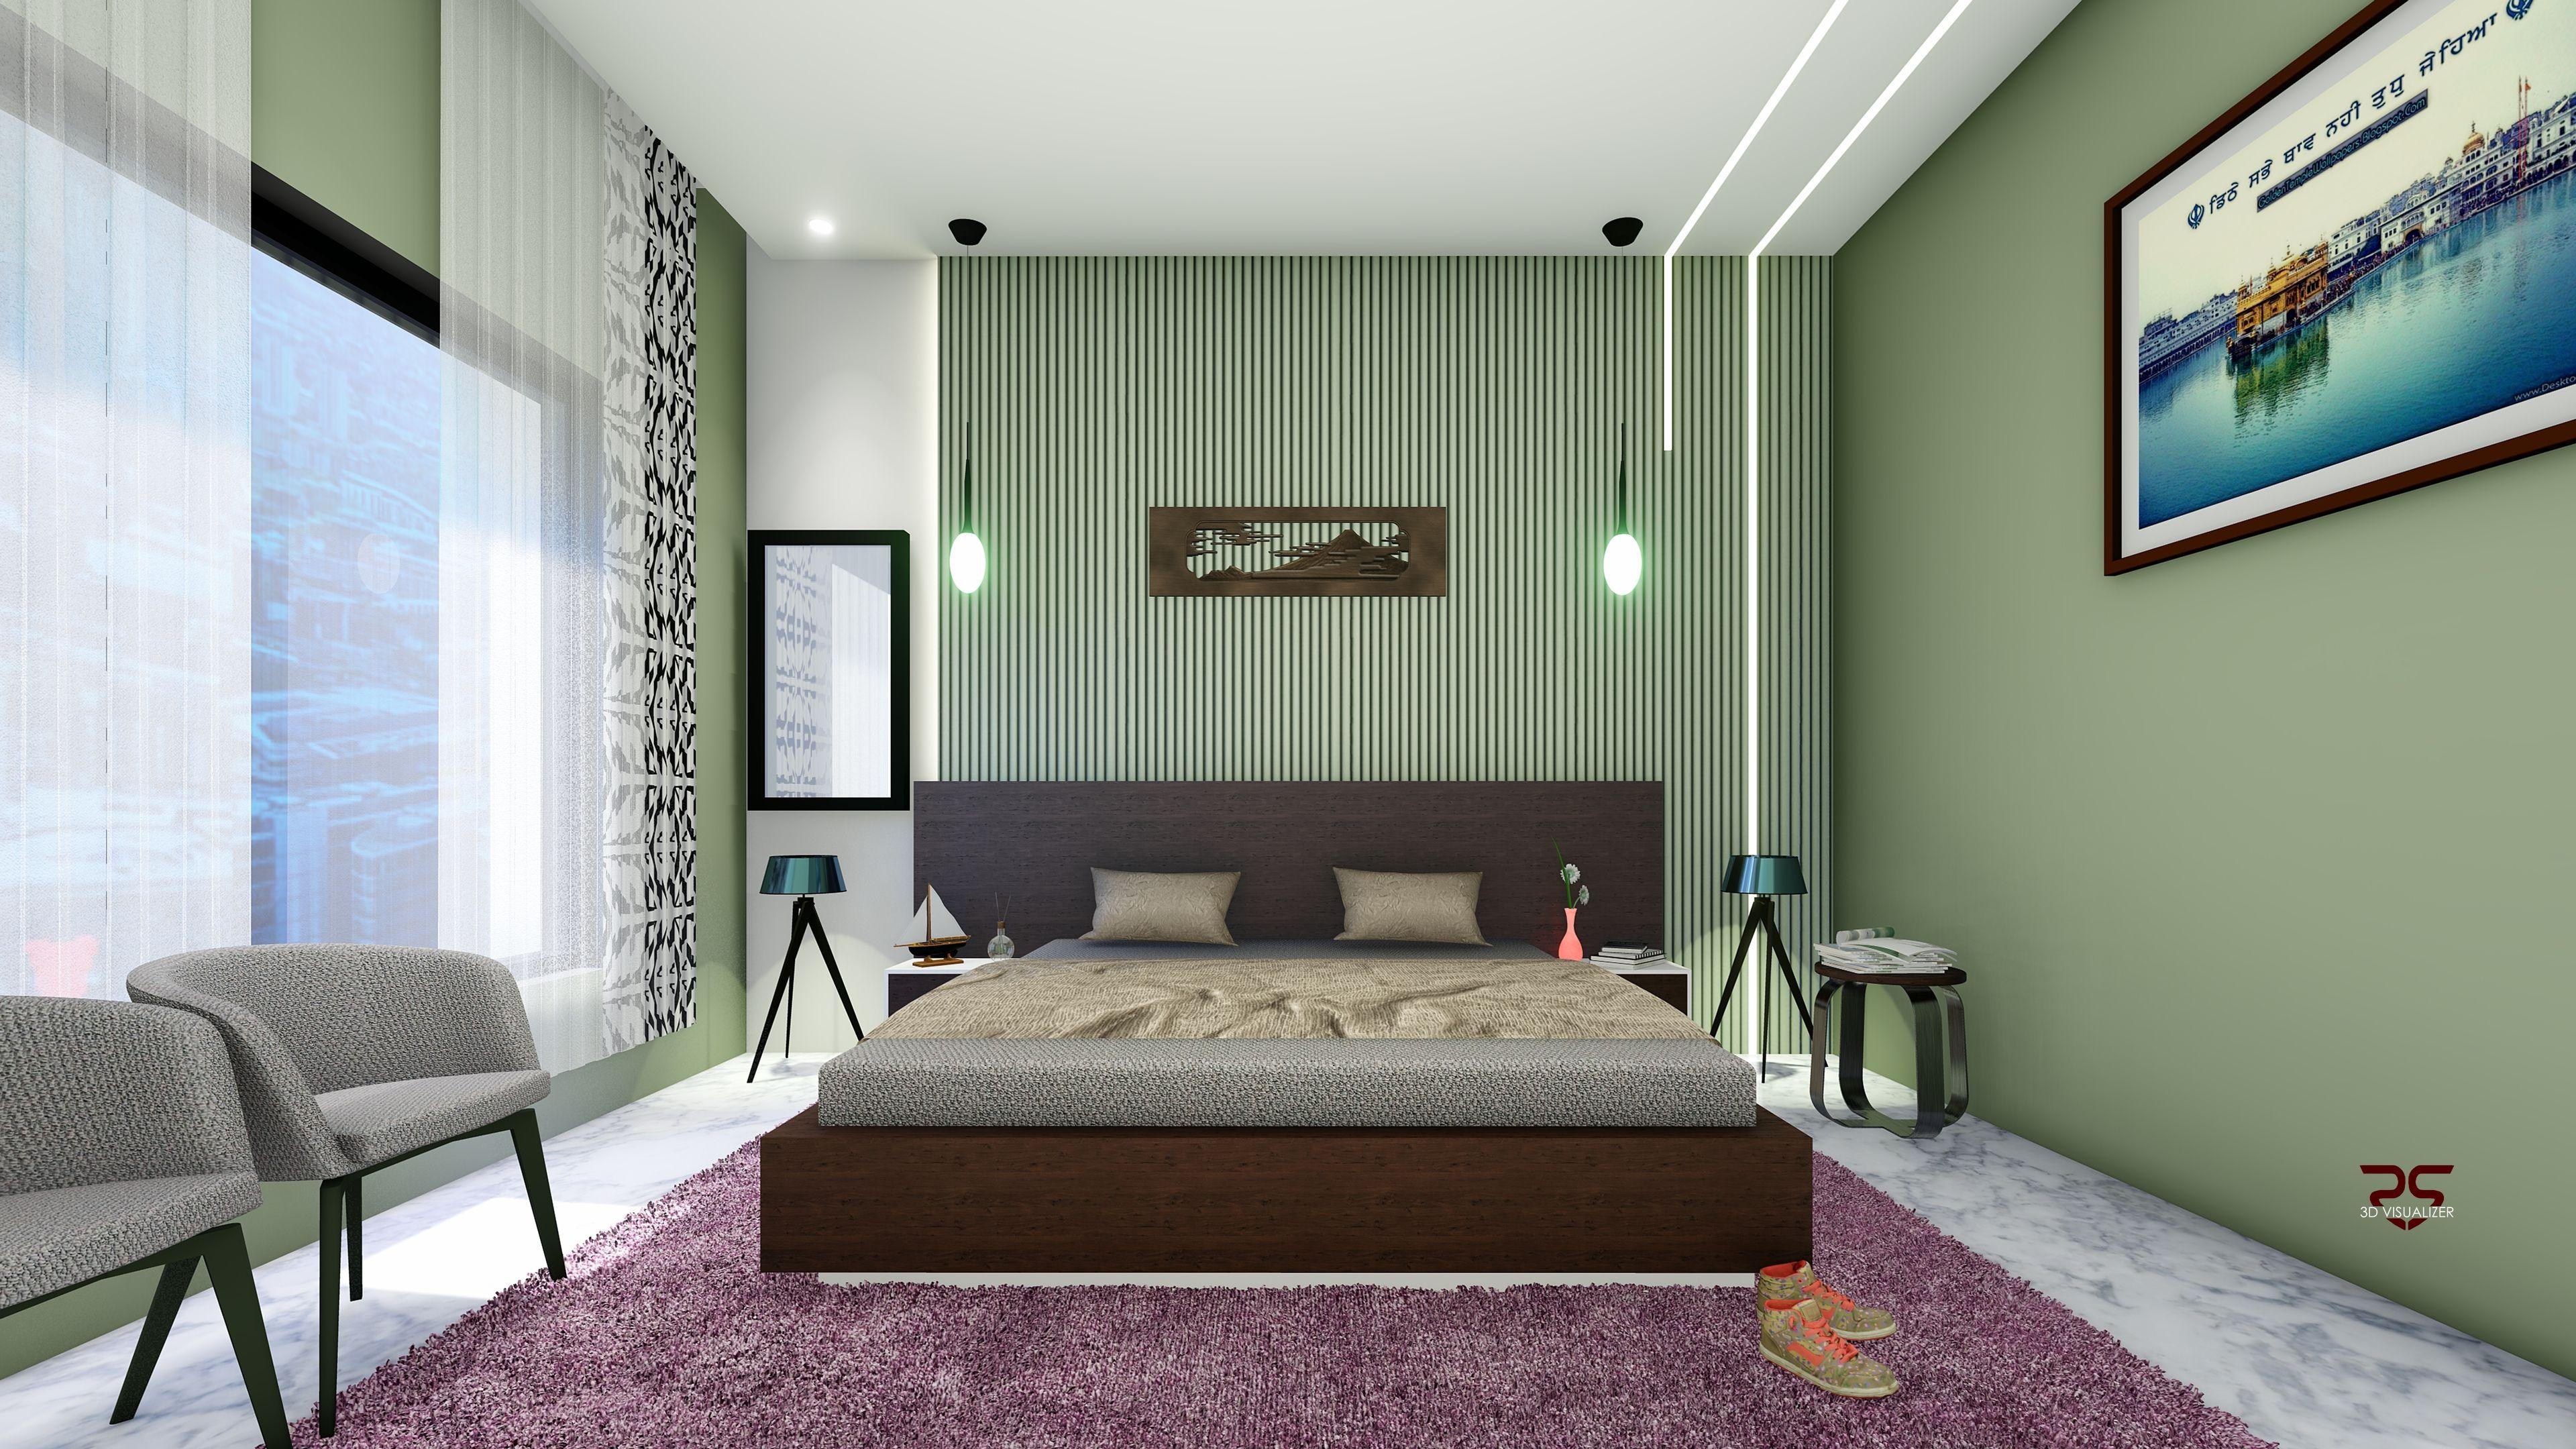 12x14 Feet Bed Room Interior Design Interior Design Bedroom